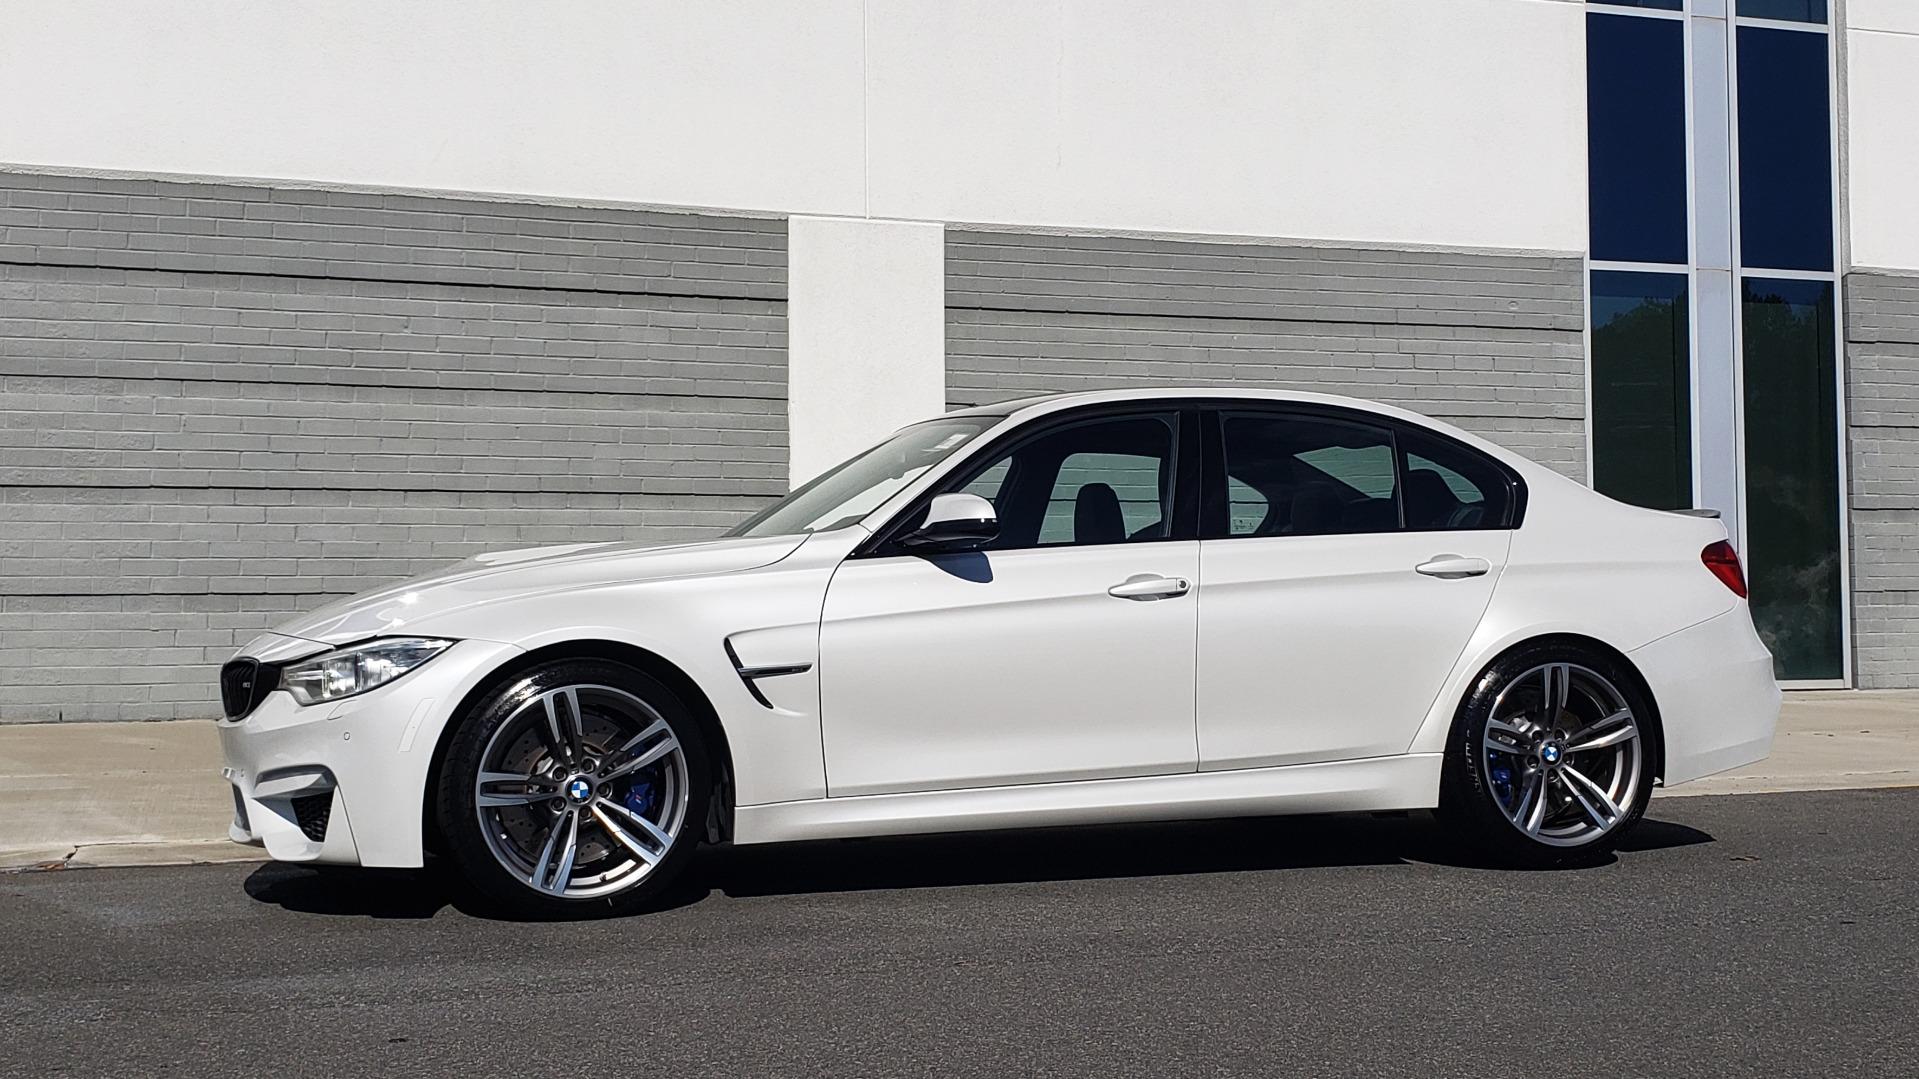 Used 2016 BMW M3 SEDAN / EXECUTIVE PKG / M-SUSPENSION / HARMAN/KARDON SOUND for sale Sold at Formula Imports in Charlotte NC 28227 5